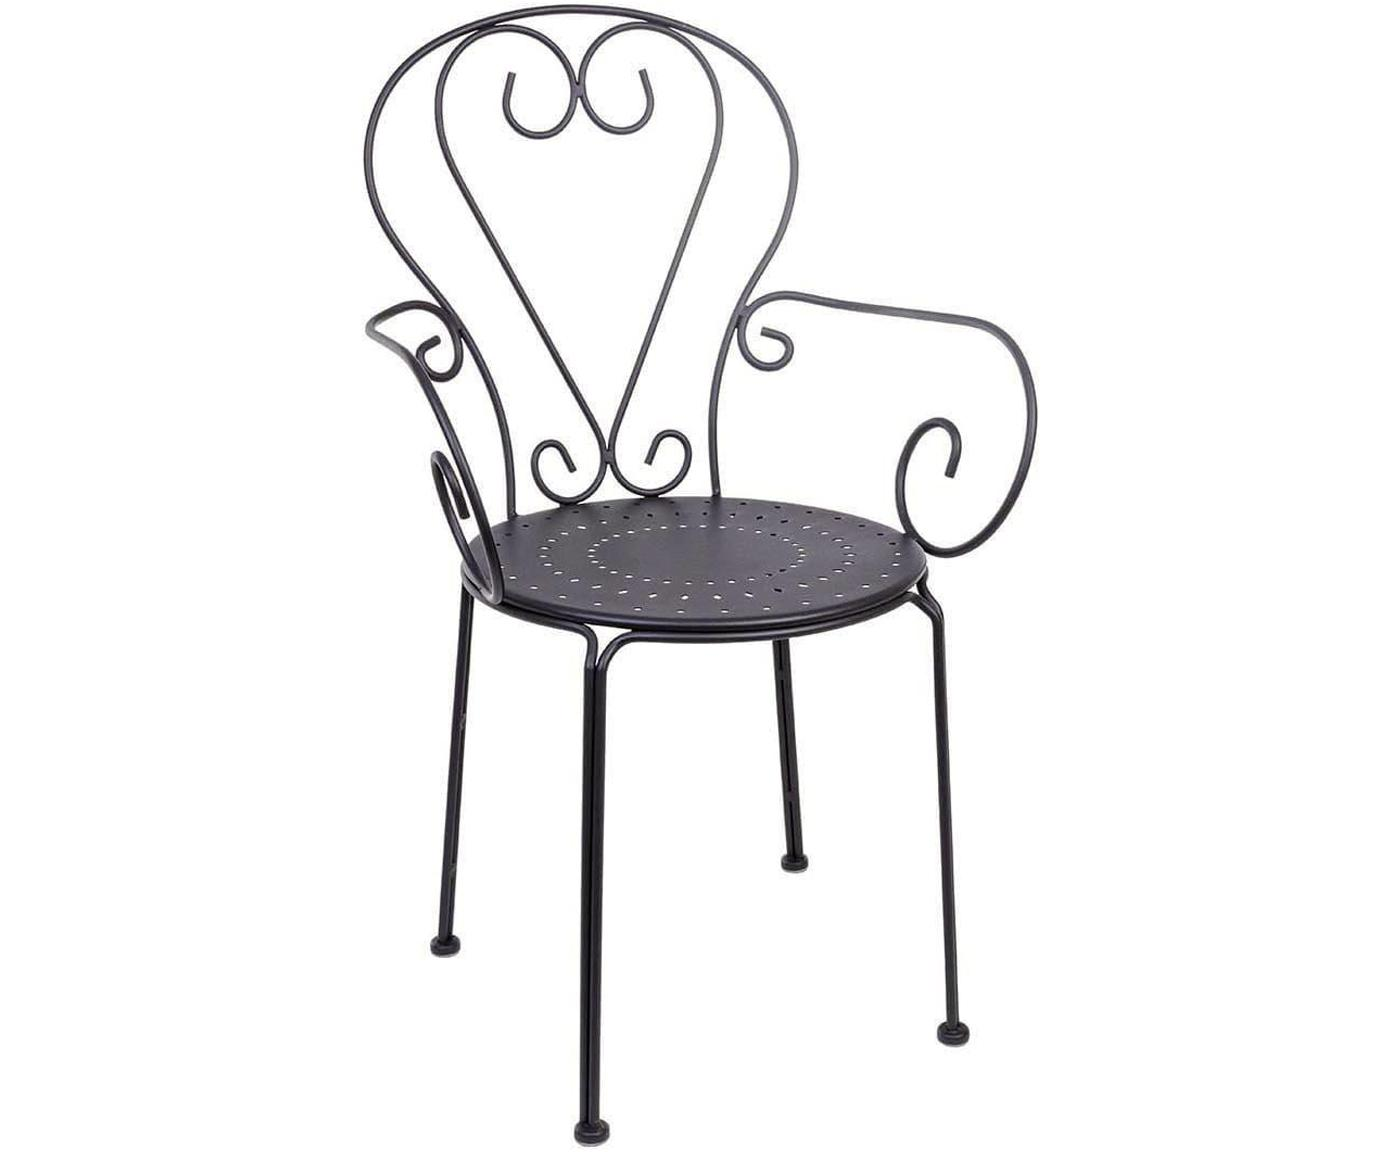 Silla Etienne, Acero tratado para exterior con pintura en polvo, Gris oscuro, An 49 x Al 89 cm